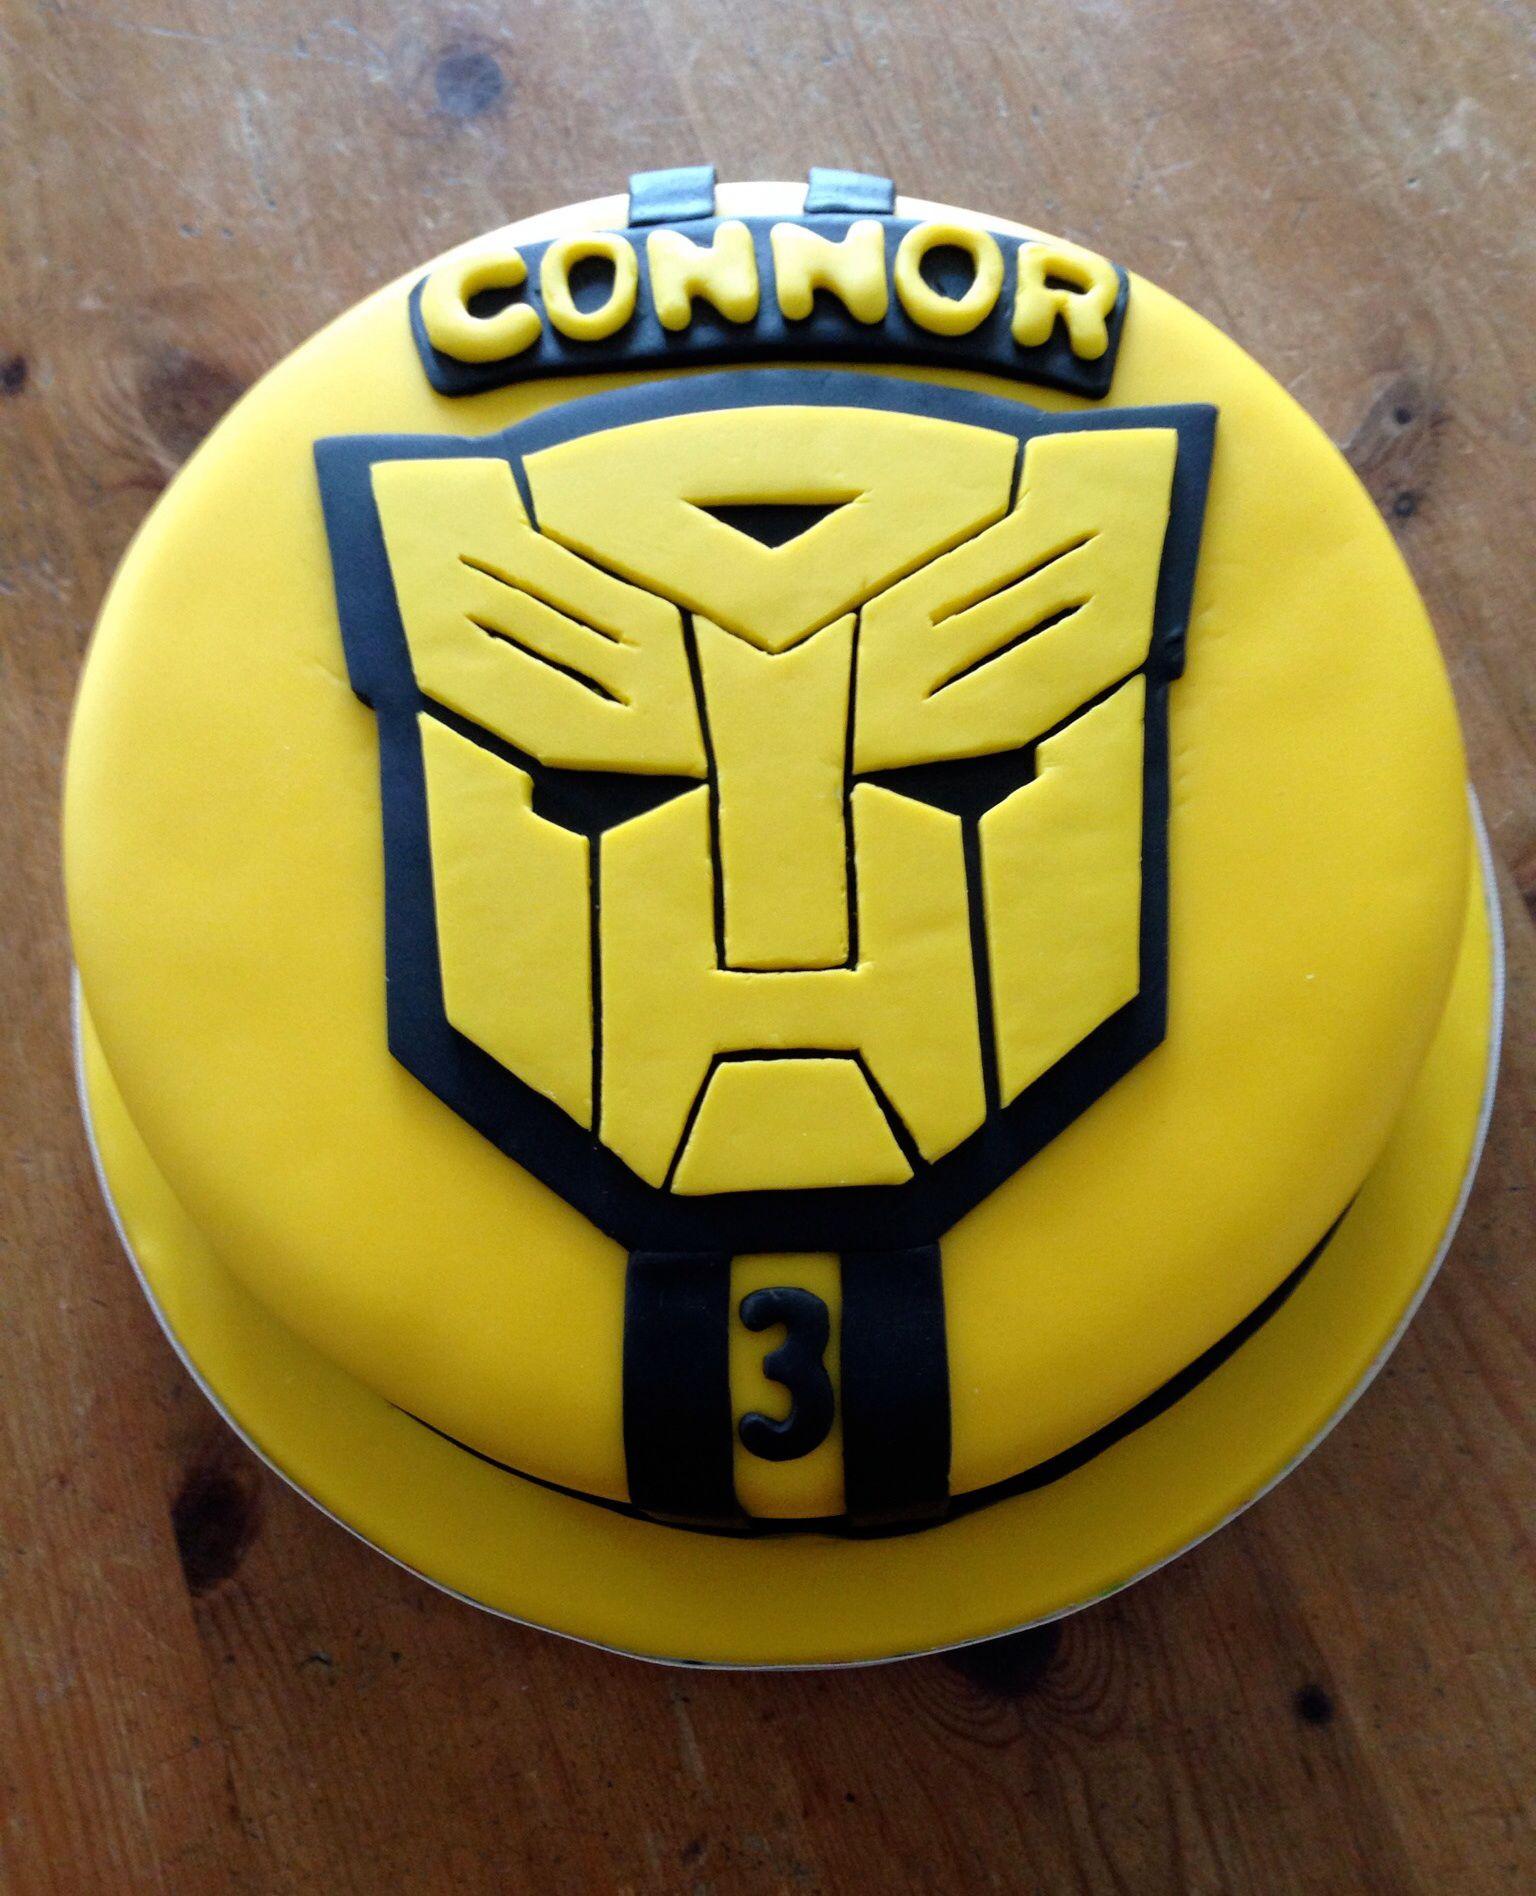 17 11 13 Bumblebee Transformer Birthday Cake